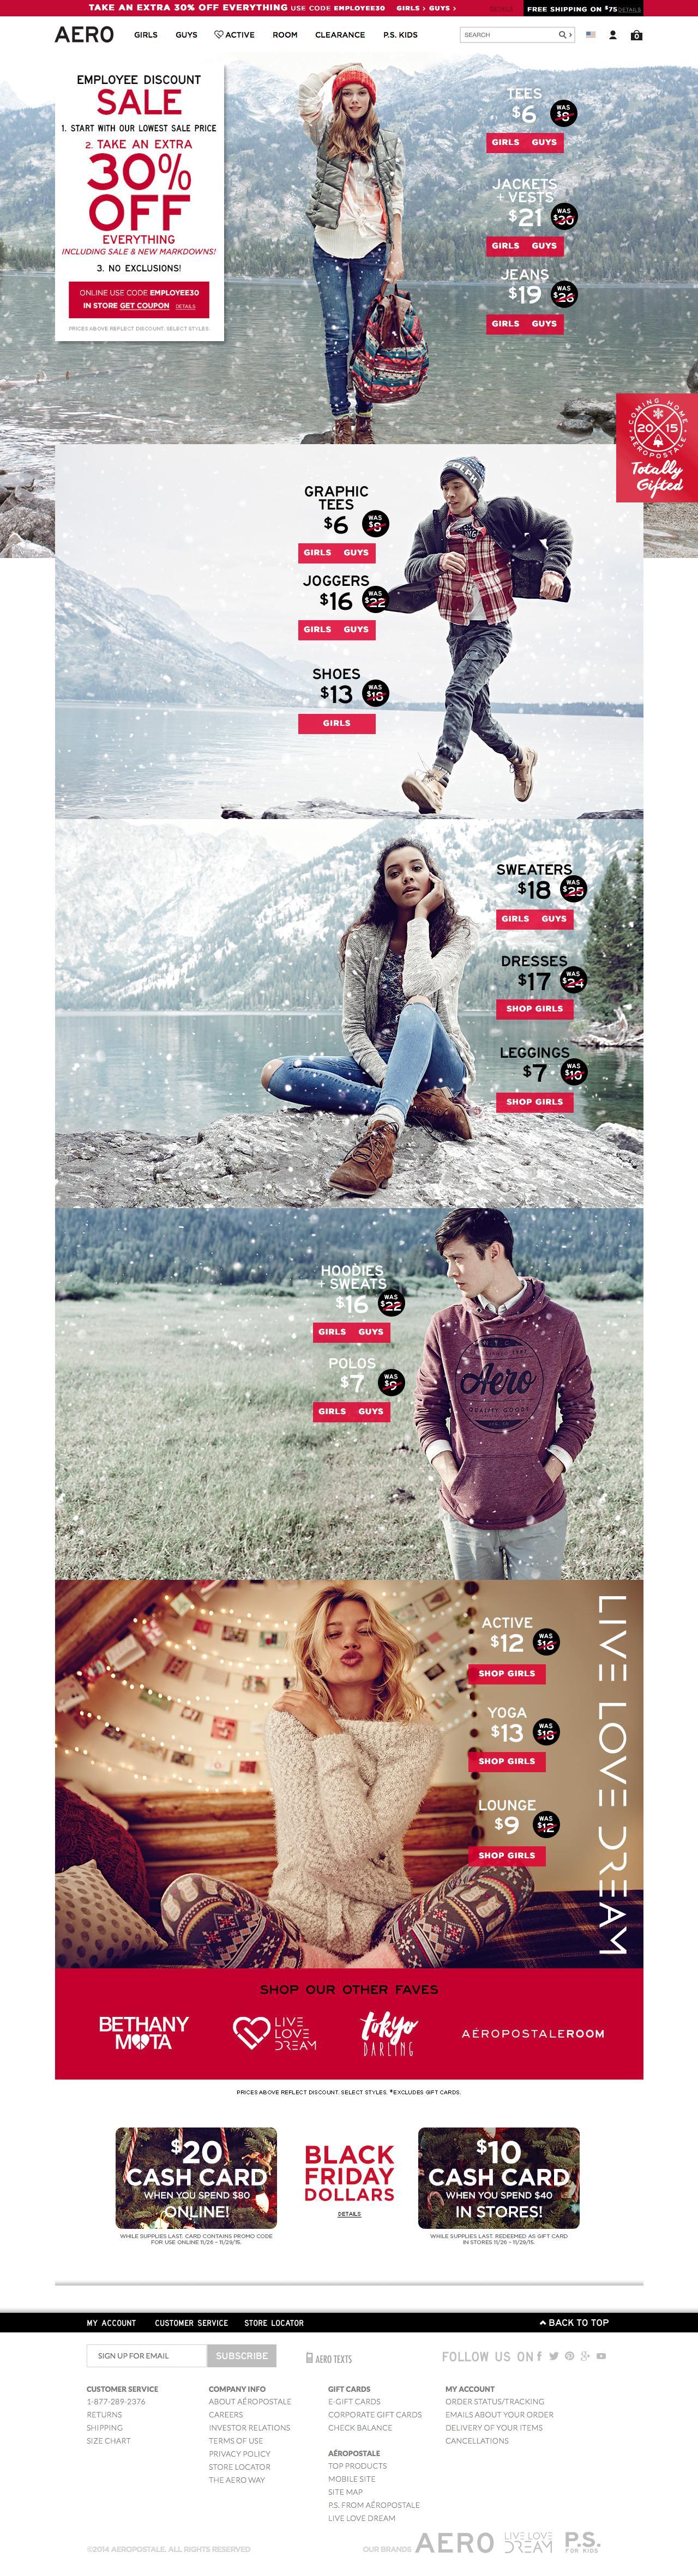 Screenshot of aeropostale.com - Guys & Girls Clothes, Hoodies, Graphic Tees & Jeans | Aeropostale - captured Nov. 11, 2015